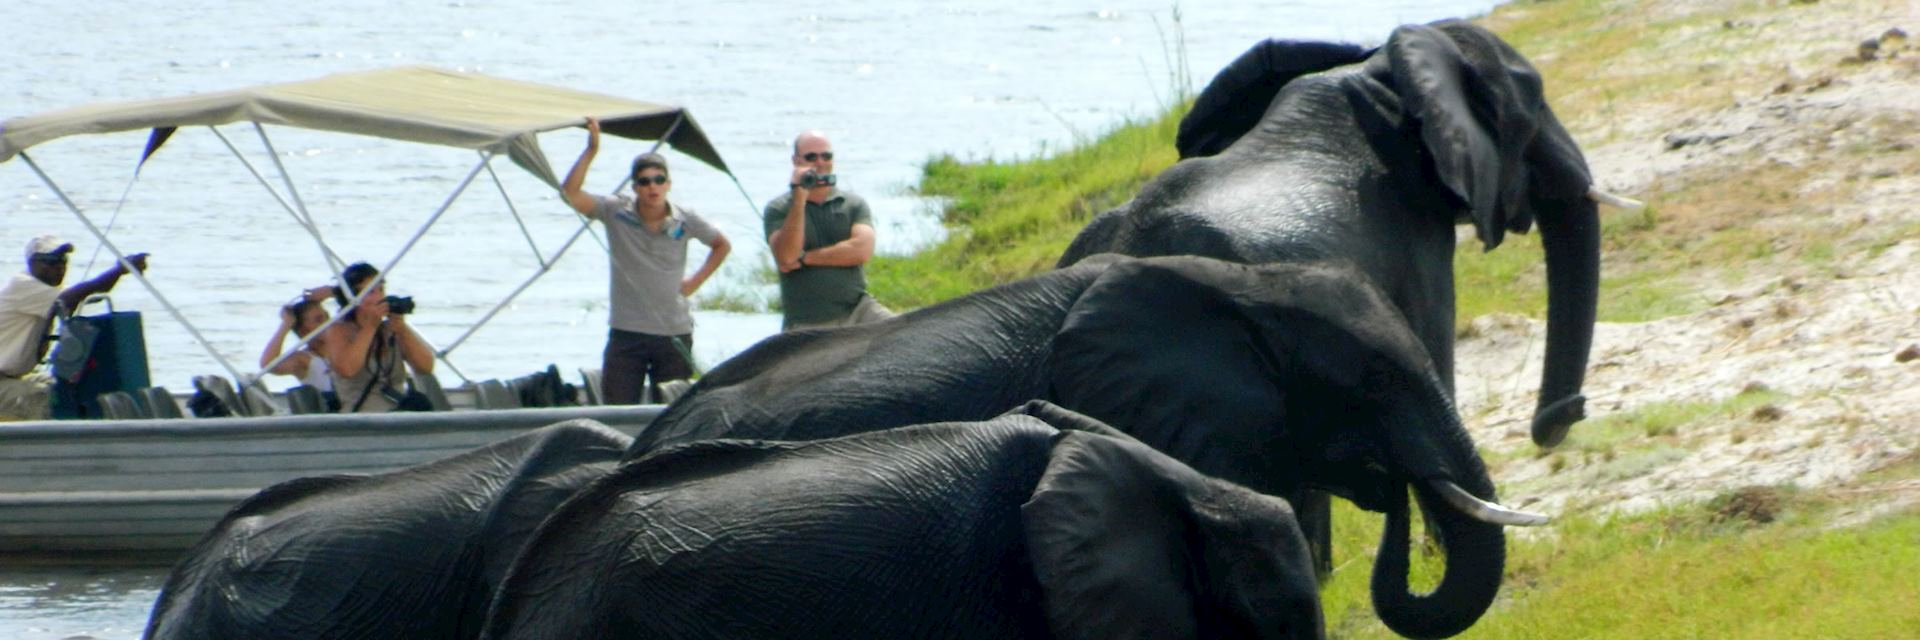 Elephants crossing river, Impalila Island, Namibia